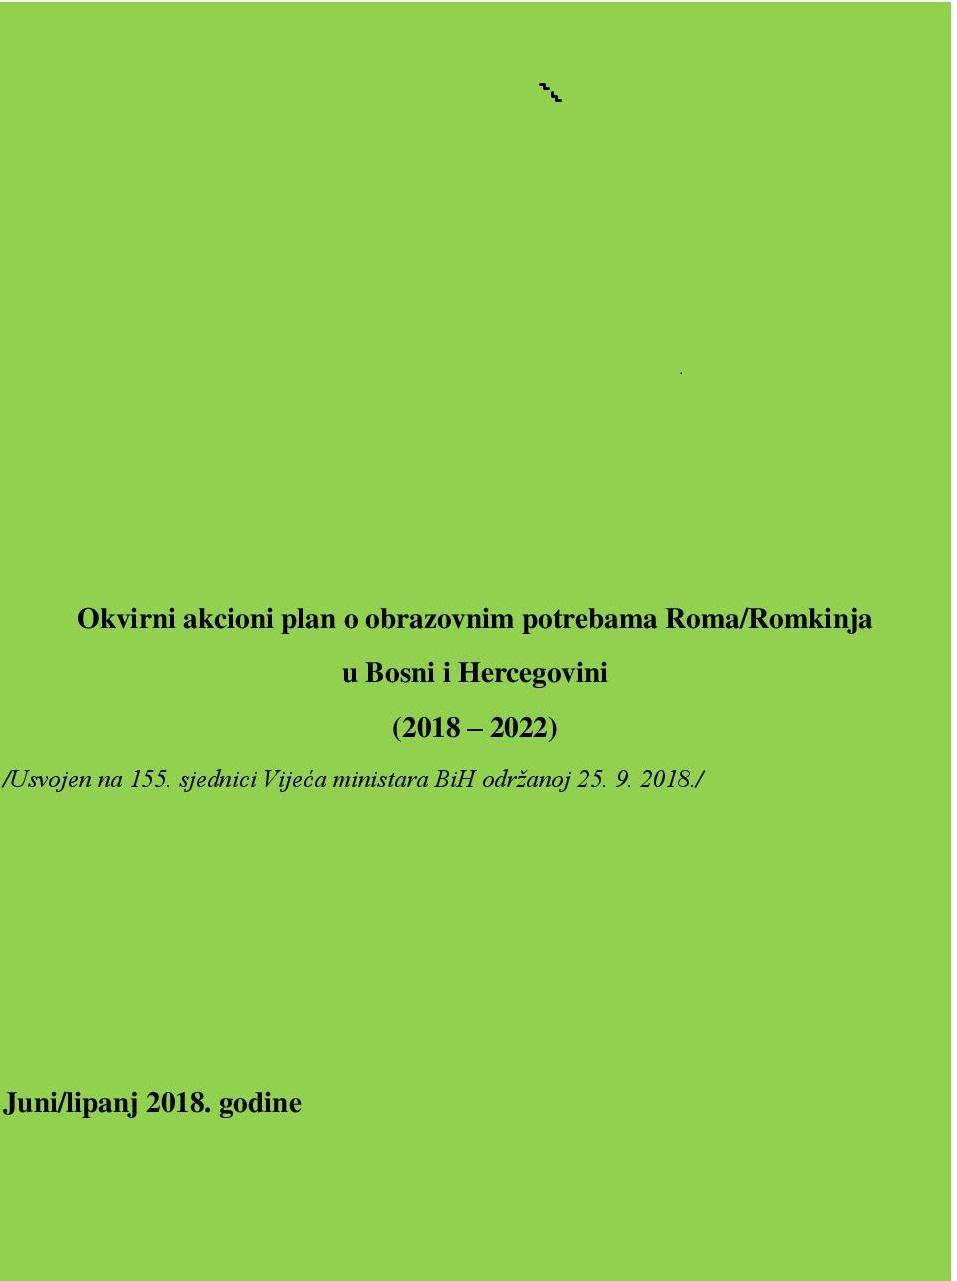 Framework Action Plan on Education